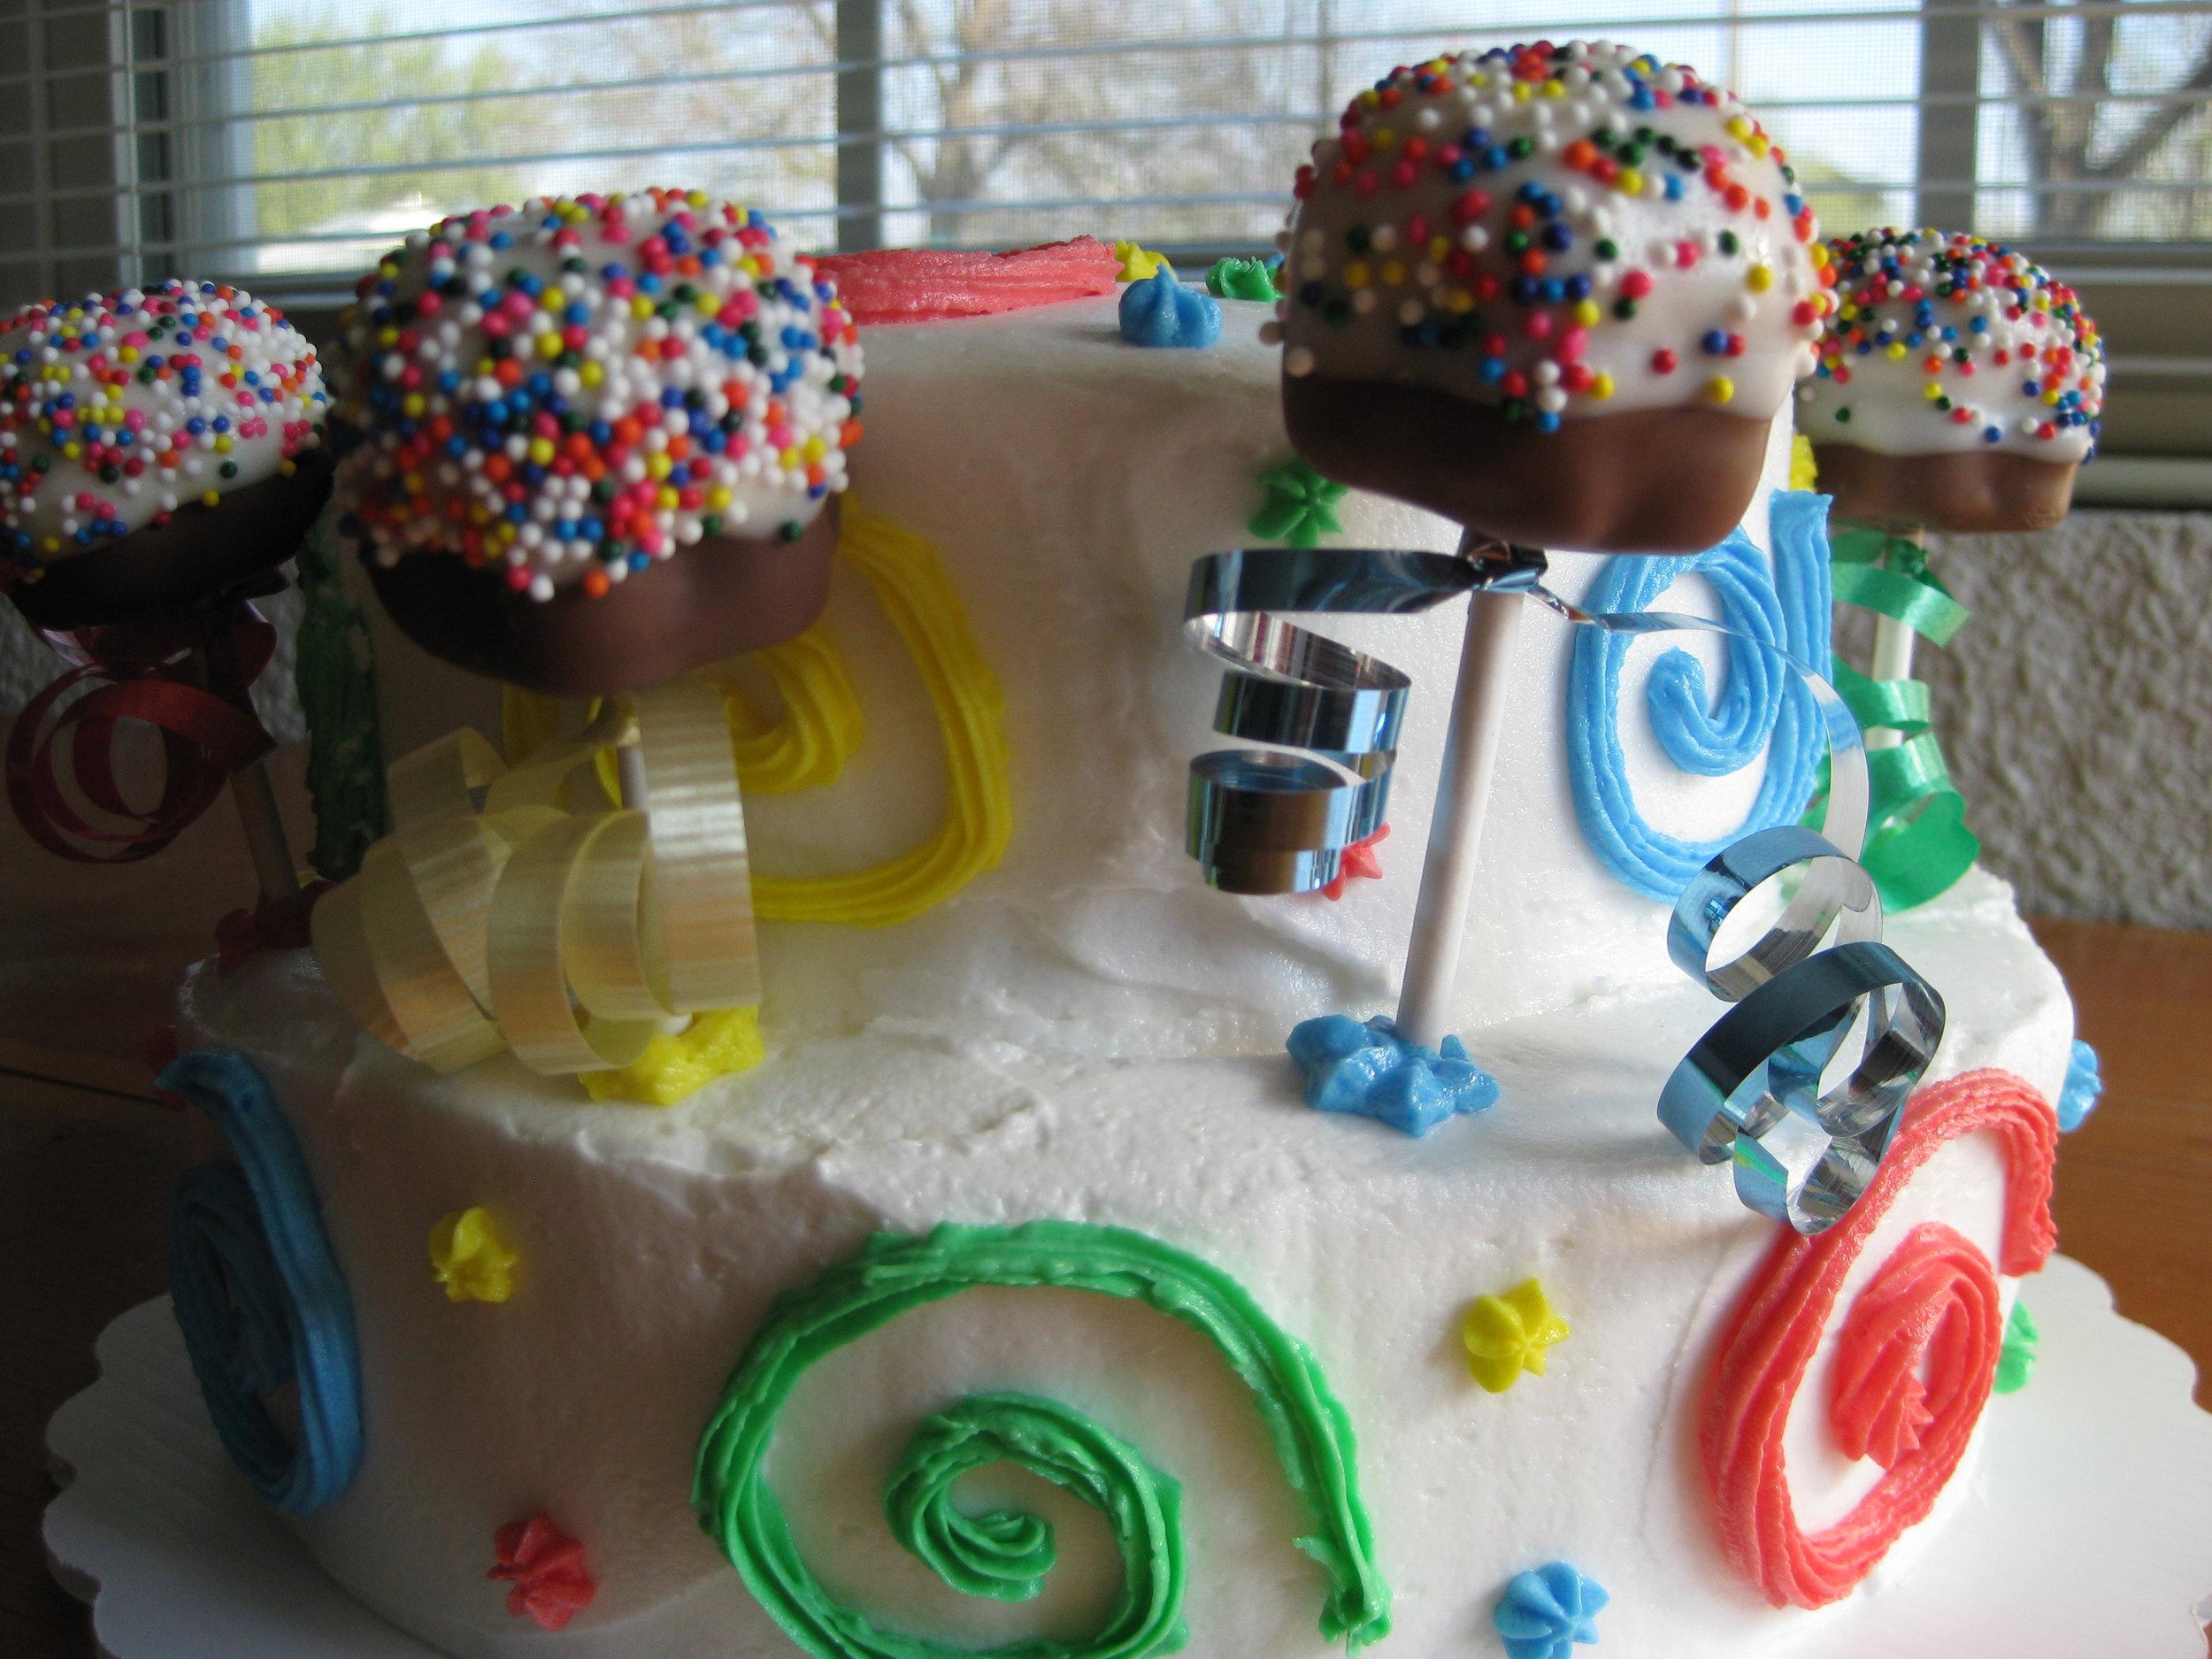 cakewpops